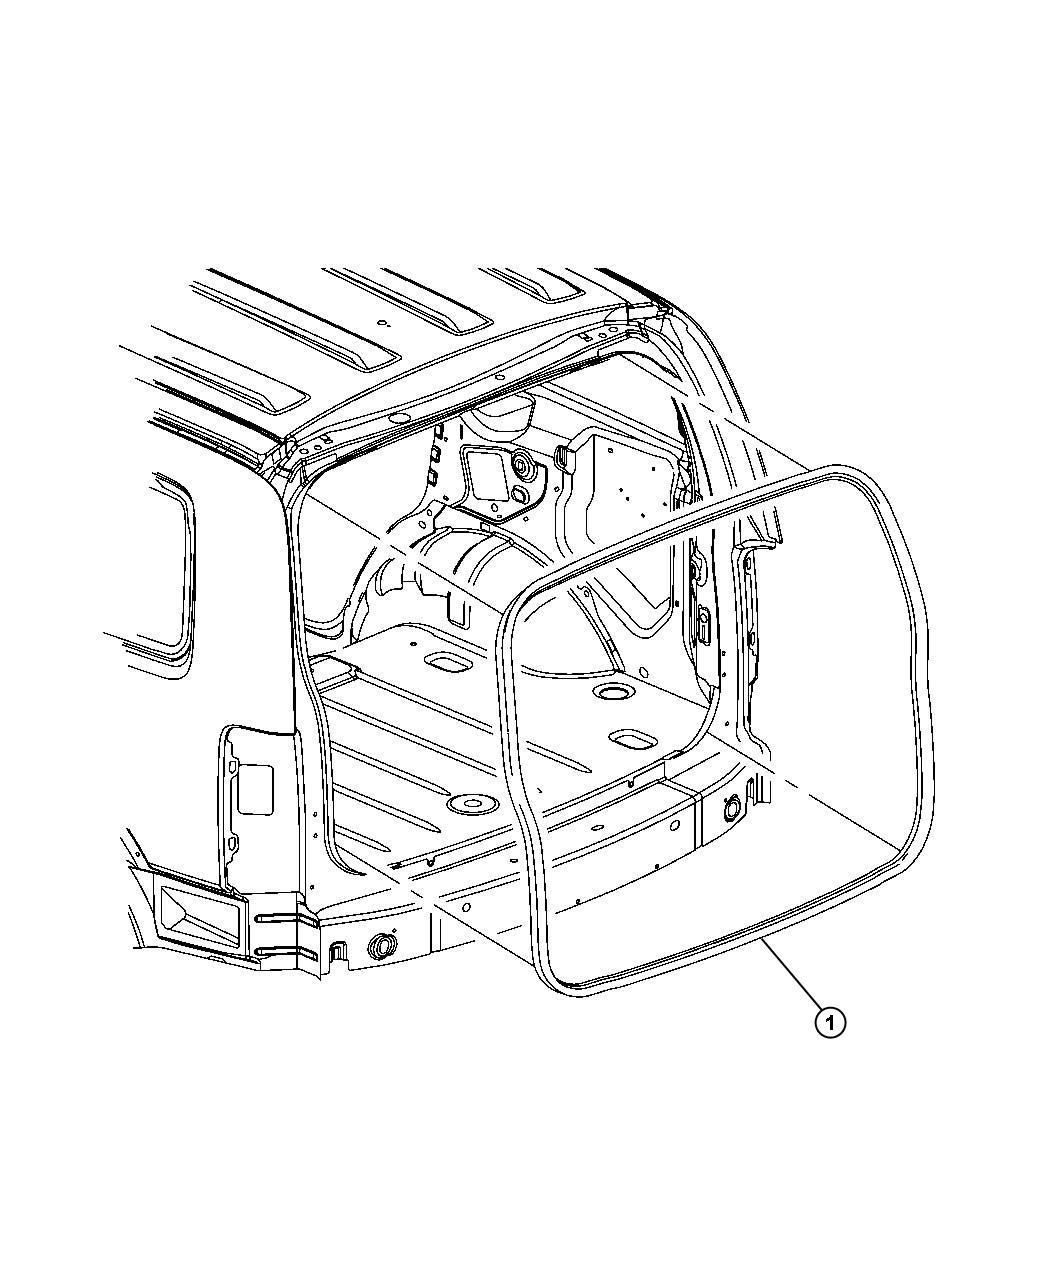 2011 Dodge NITRO W/strip. Liftgate opening. Body